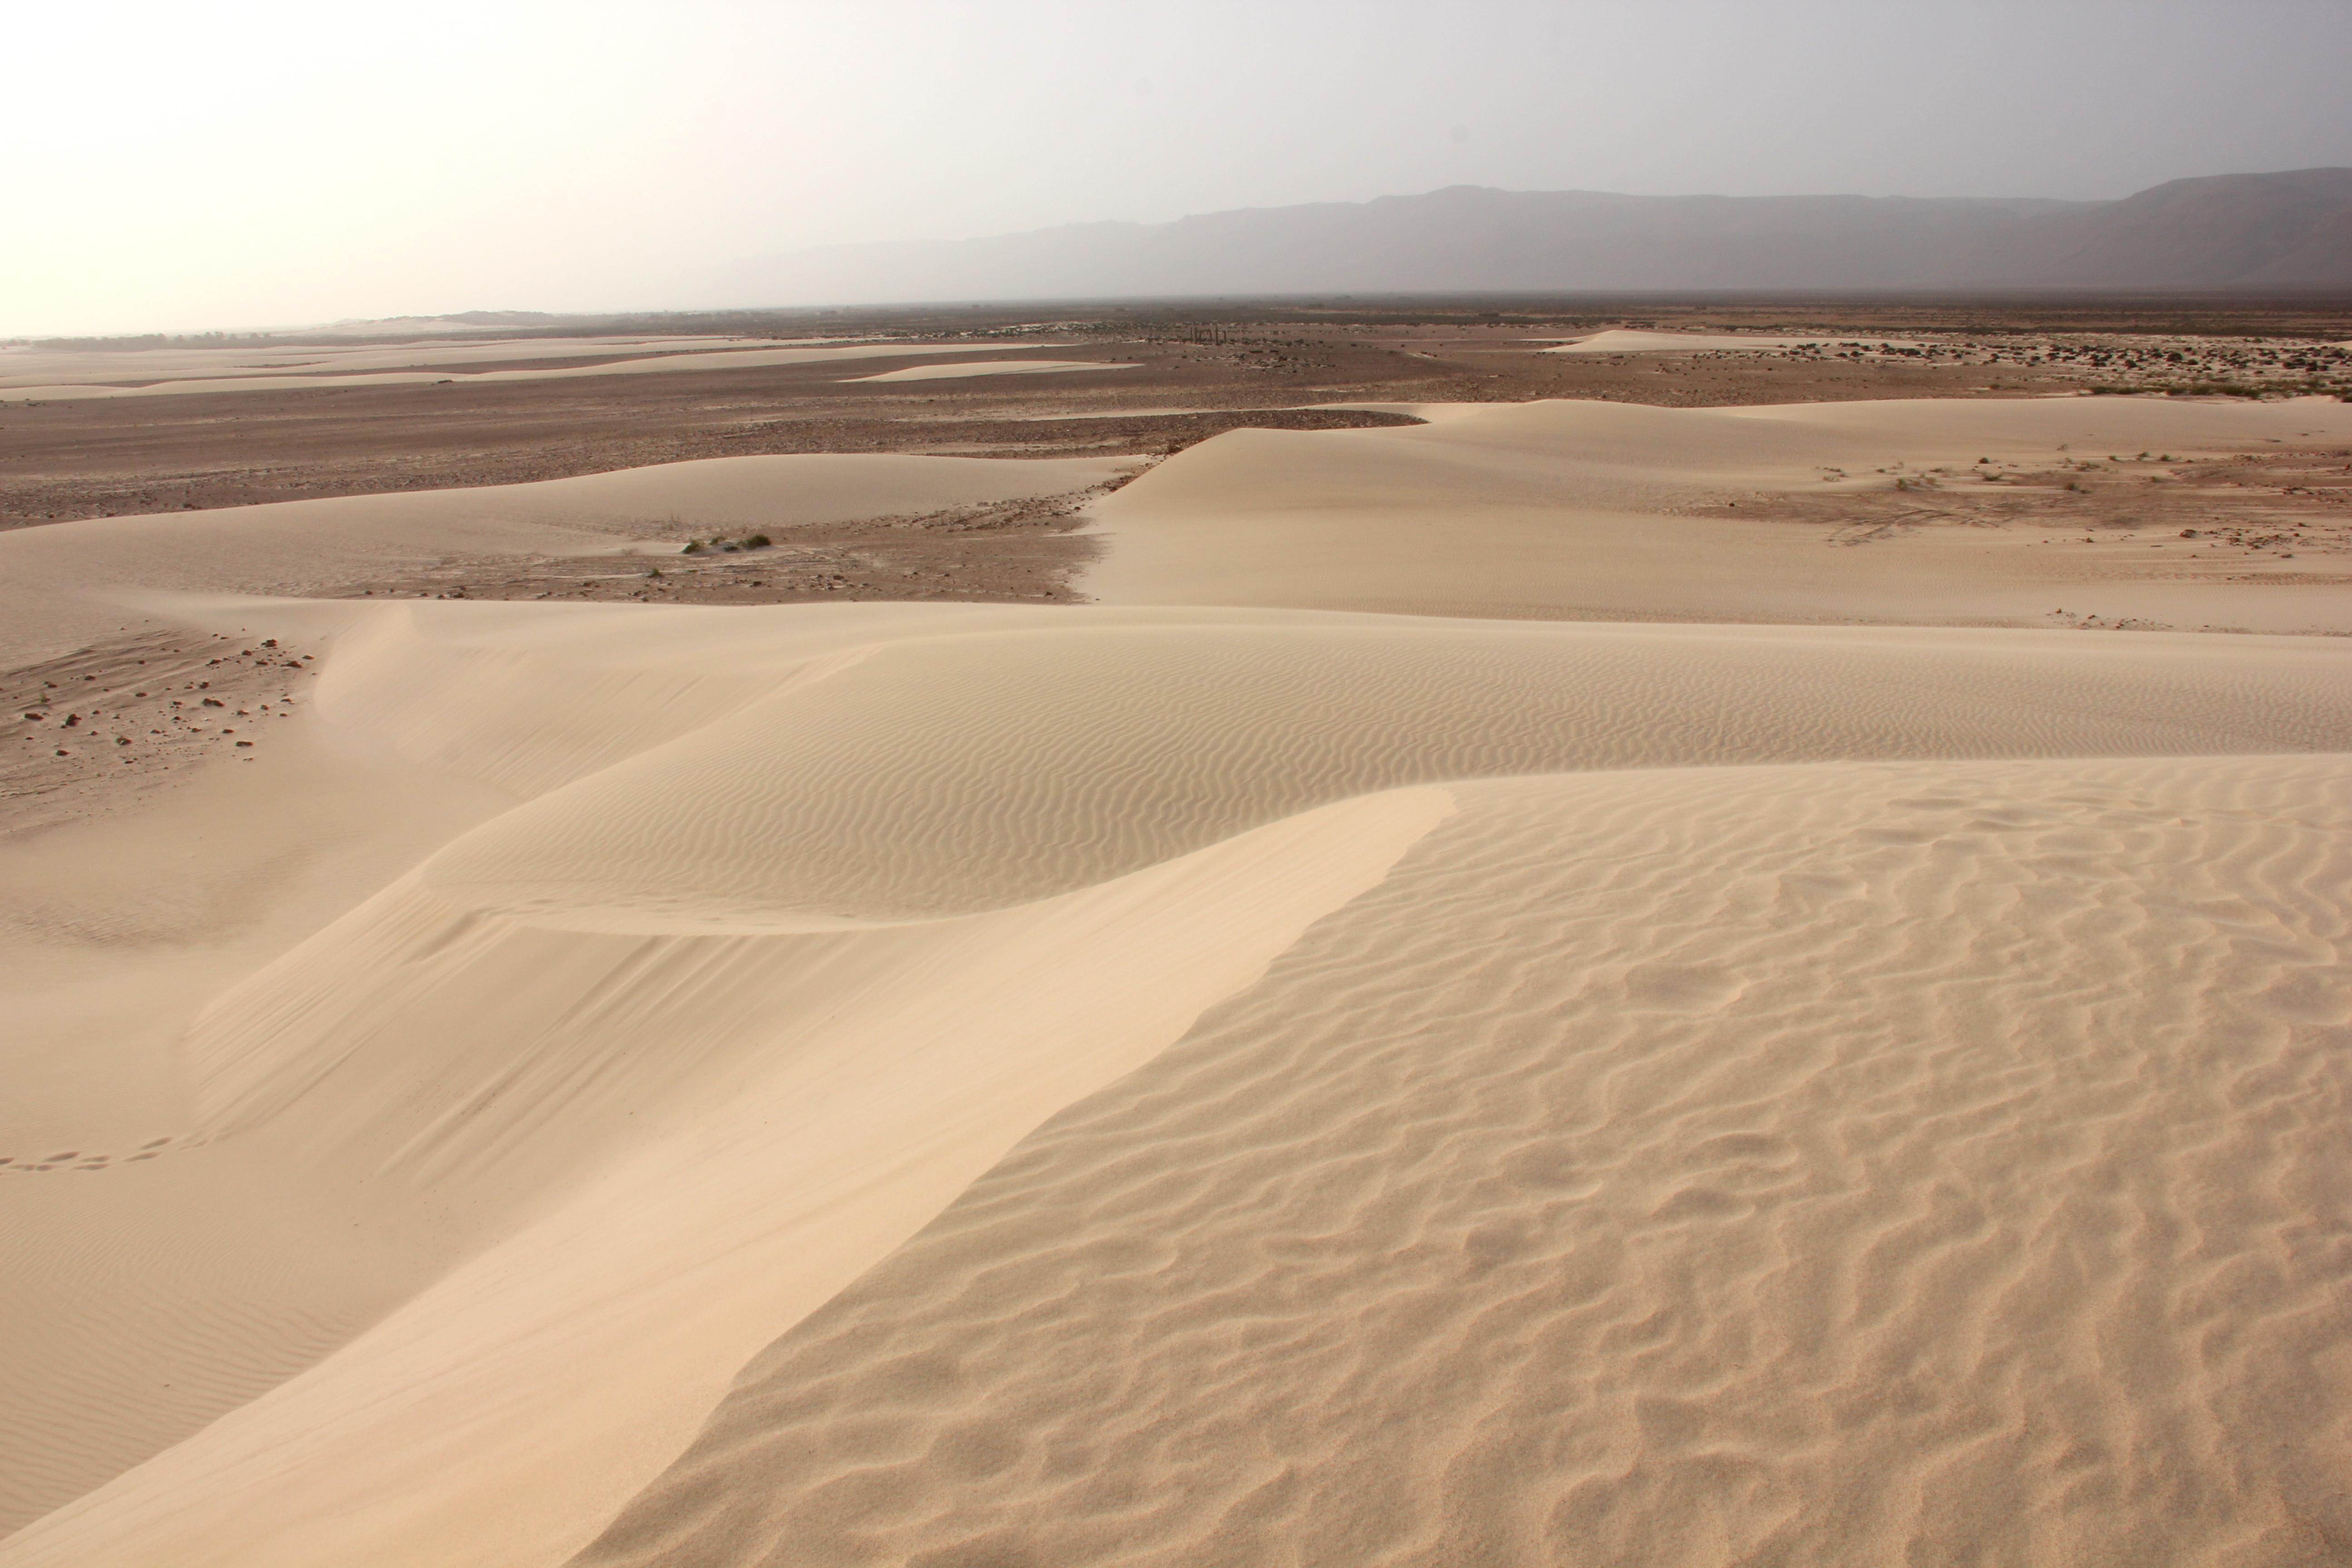 The shifting dunes of Zahak